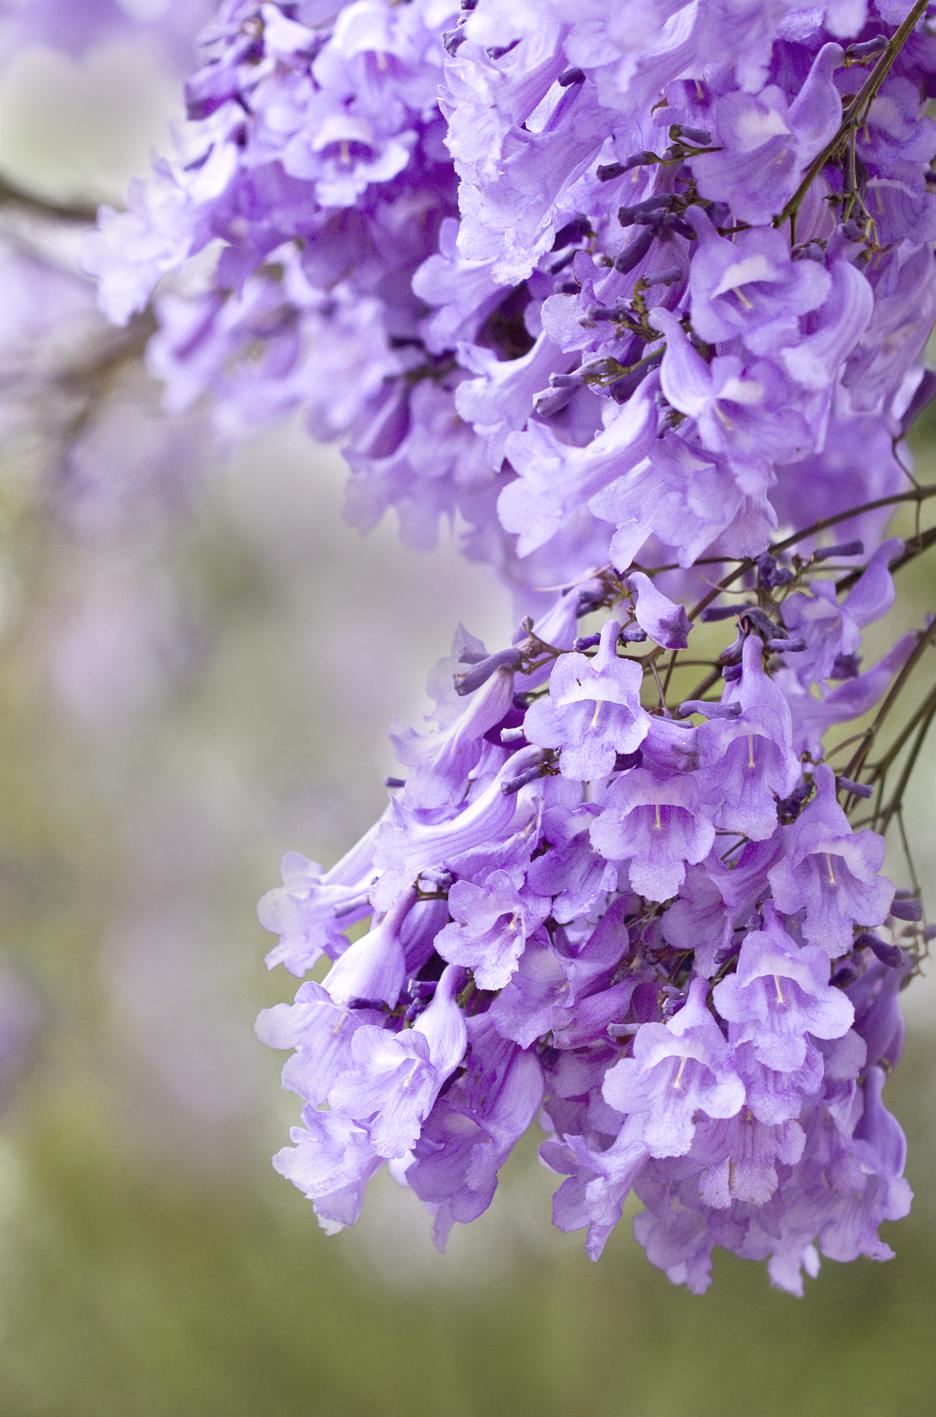 Fiori Di Colore Viola Nomi.Jacaranda Wikipedia